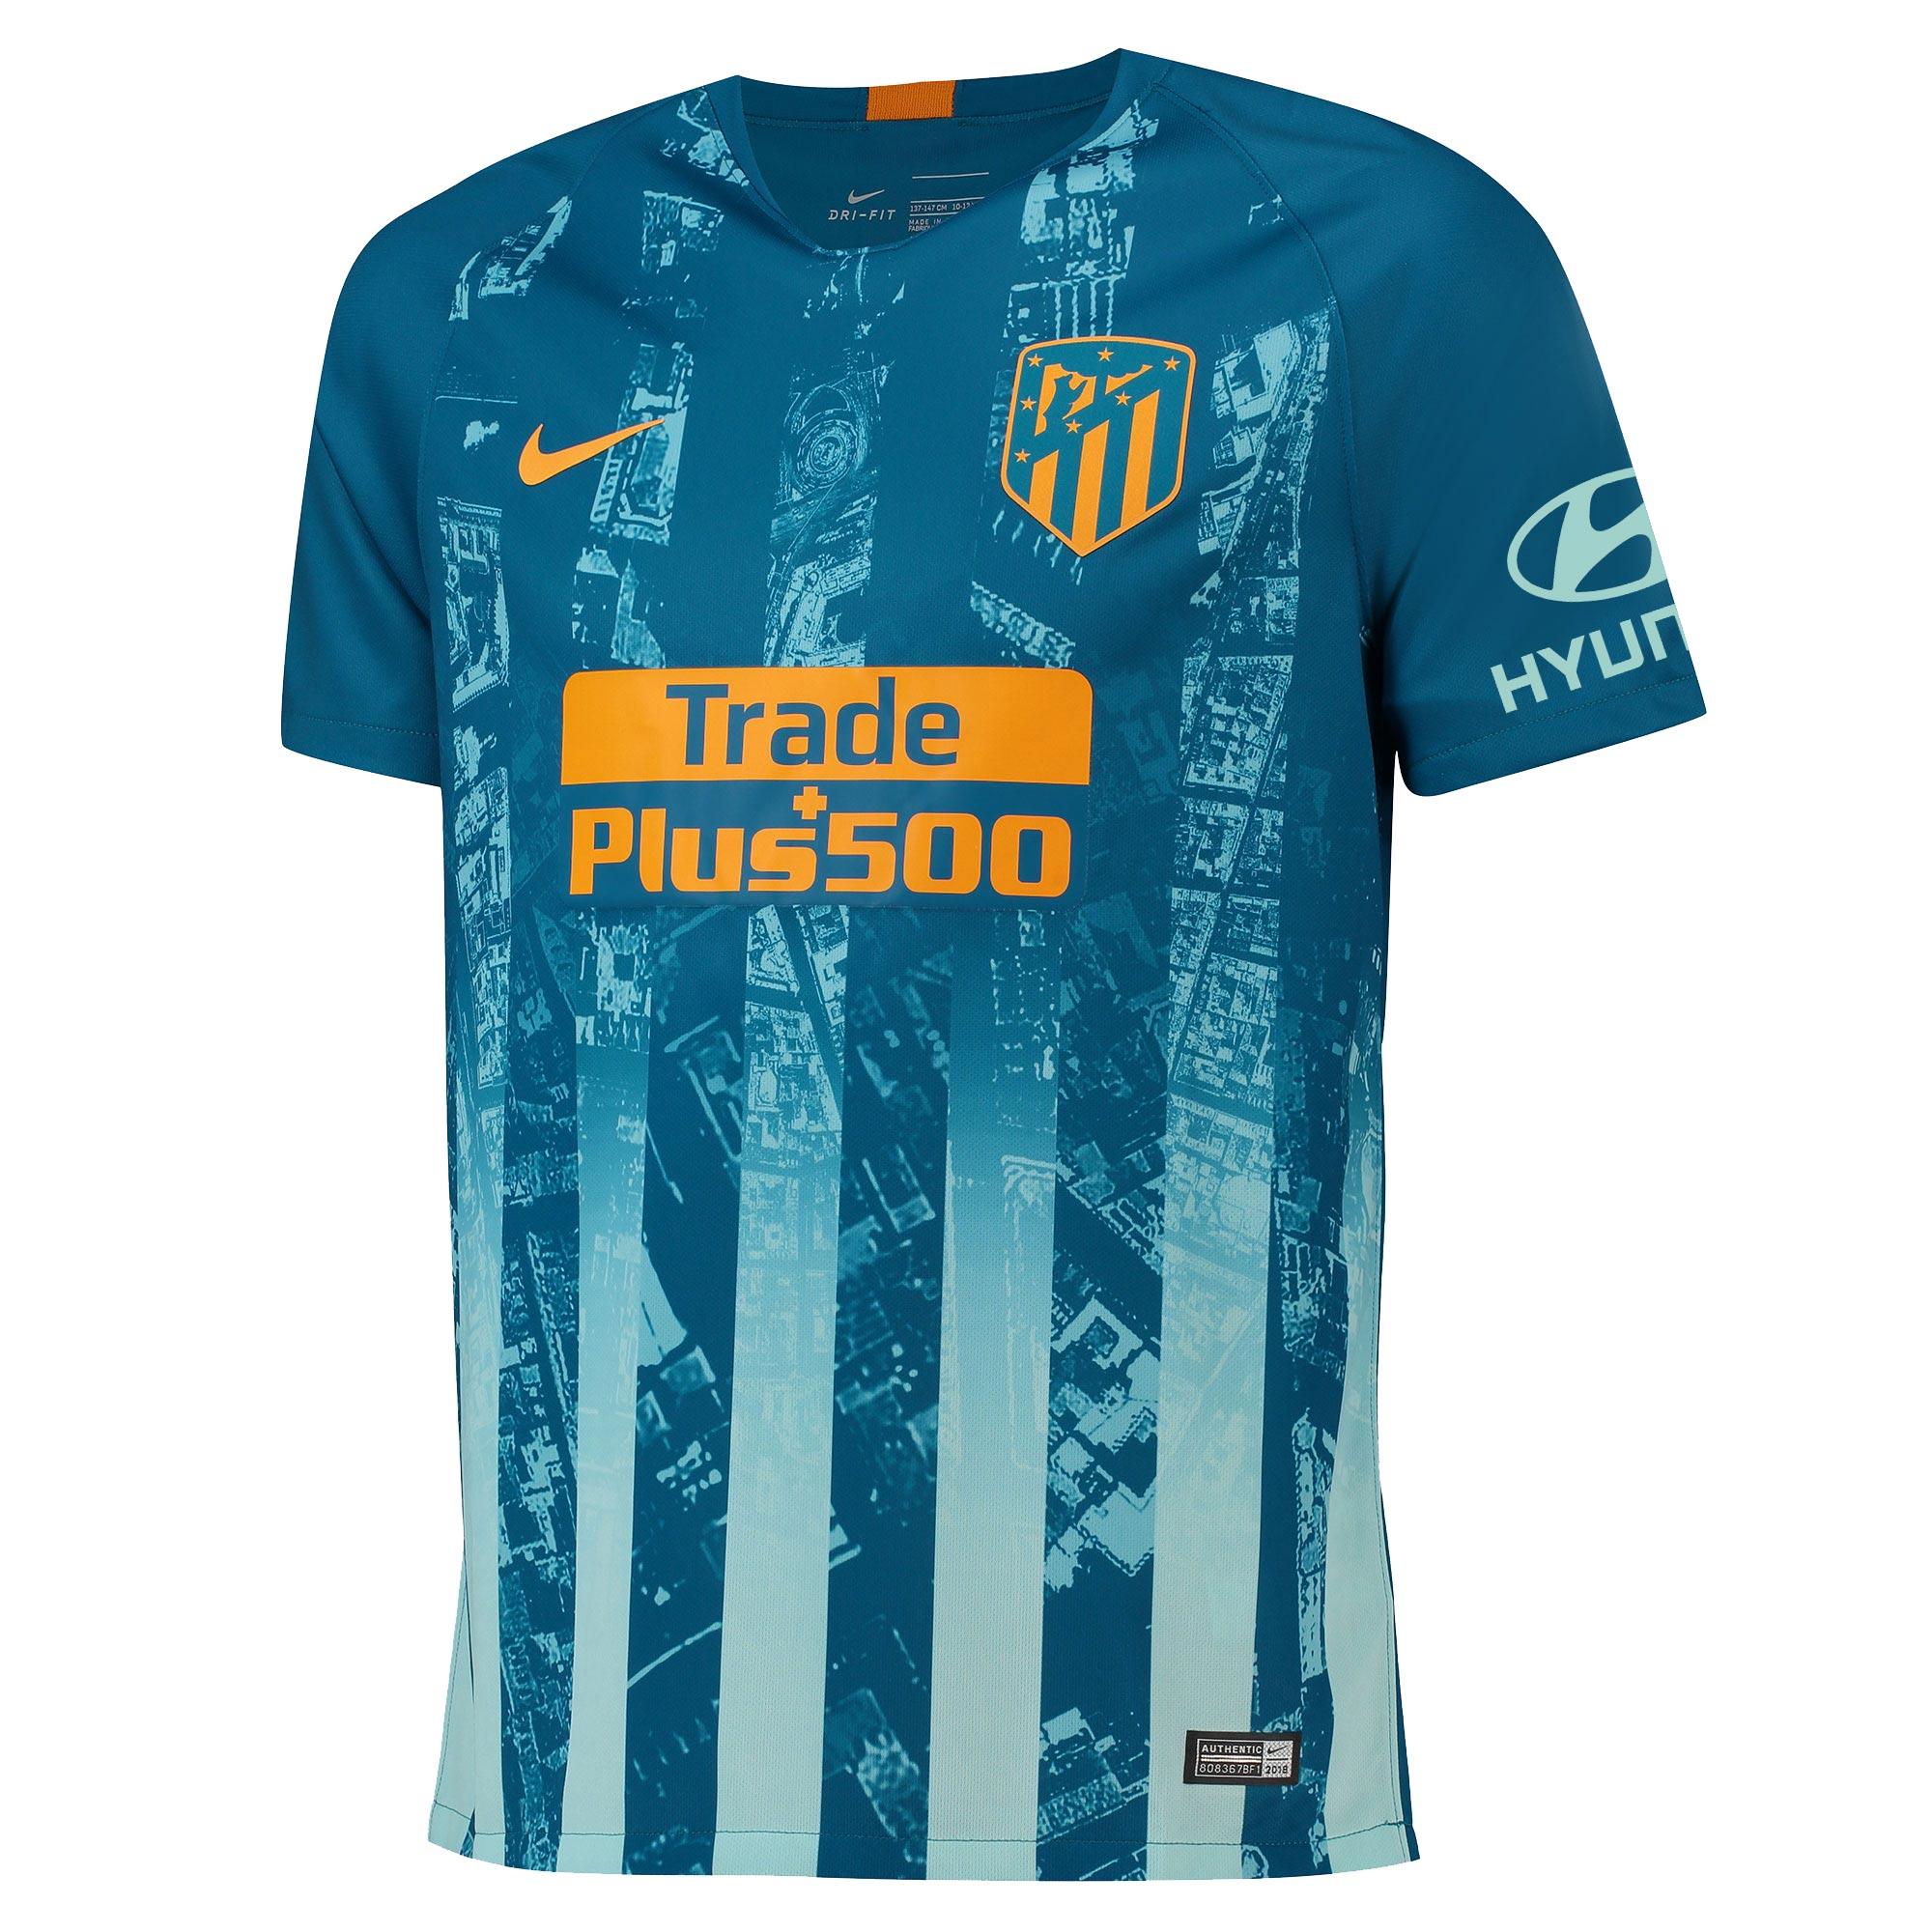 ... Atletico Madrid 2018-19 Nike Away Kit · Click to enlarge image  atletico madrid 18 19 nike third kit a.jpg ... 3190167bc